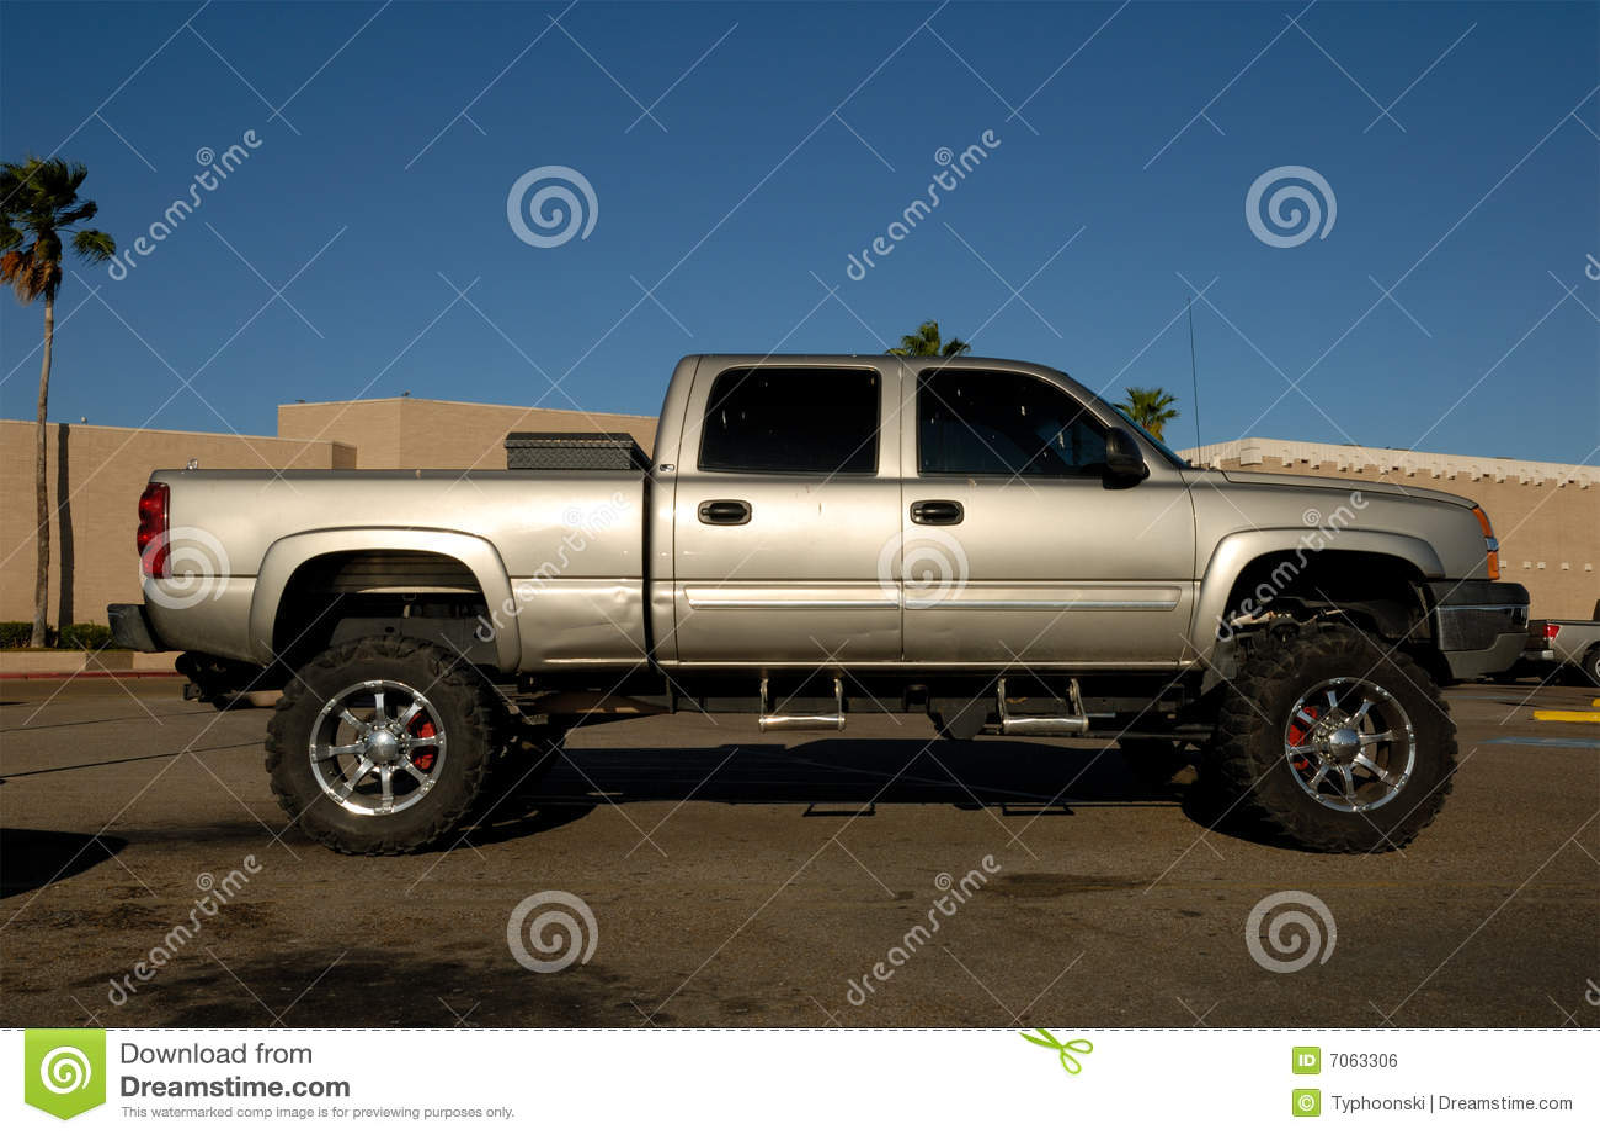 american pickup truck stock photo image of wheels truck 7063306. Black Bedroom Furniture Sets. Home Design Ideas